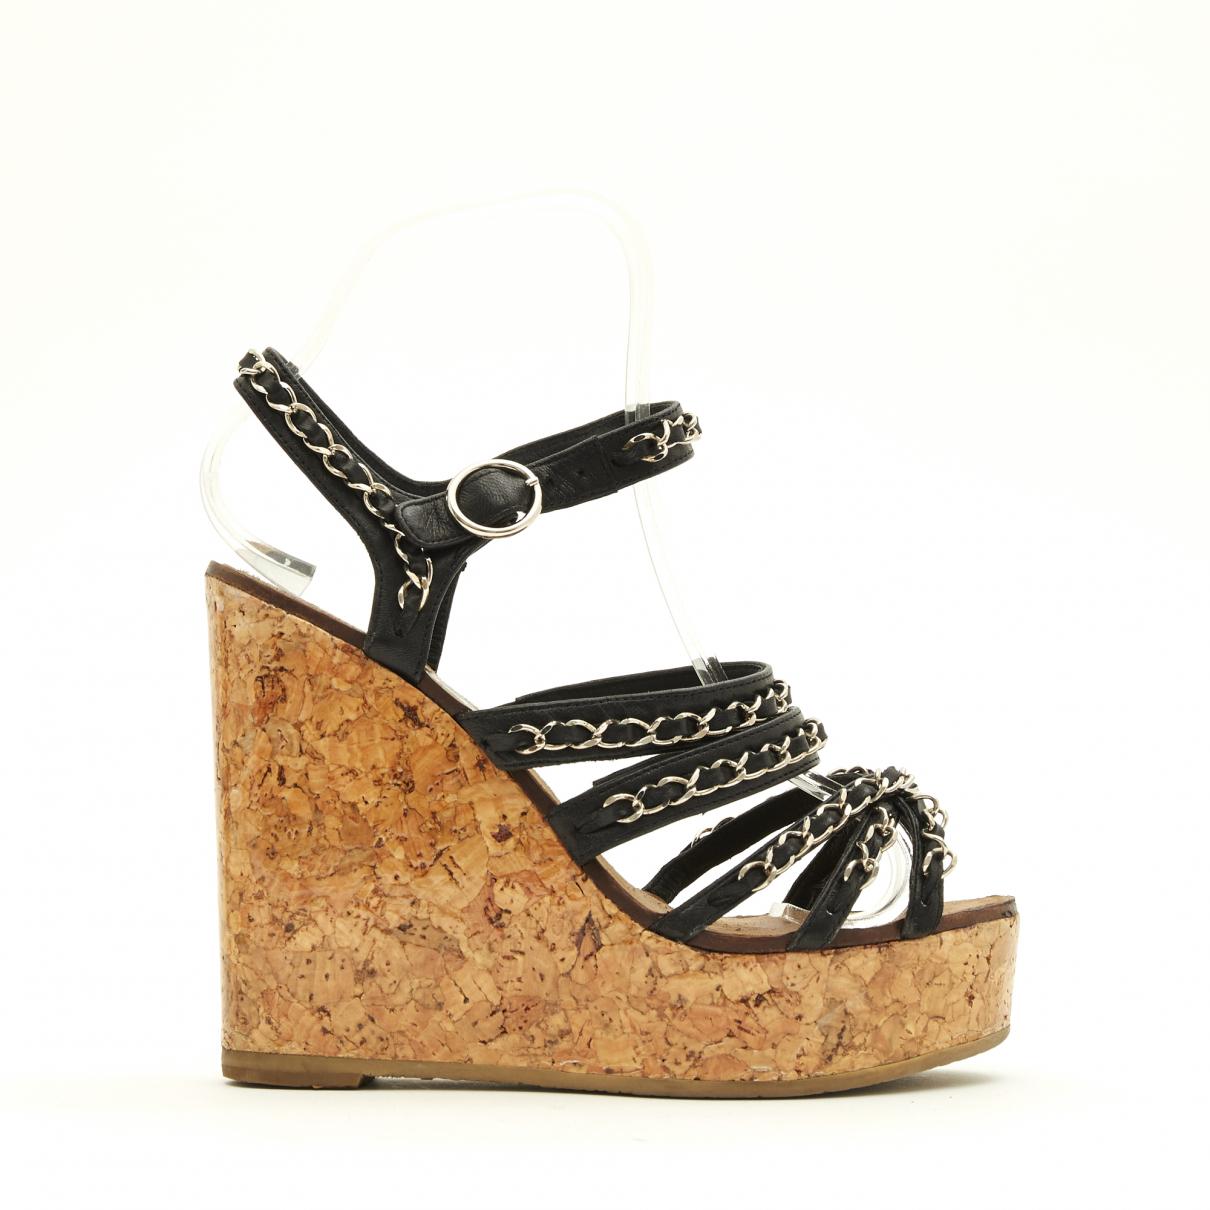 Chanel \N Black Leather Sandals for Women 36.5 EU